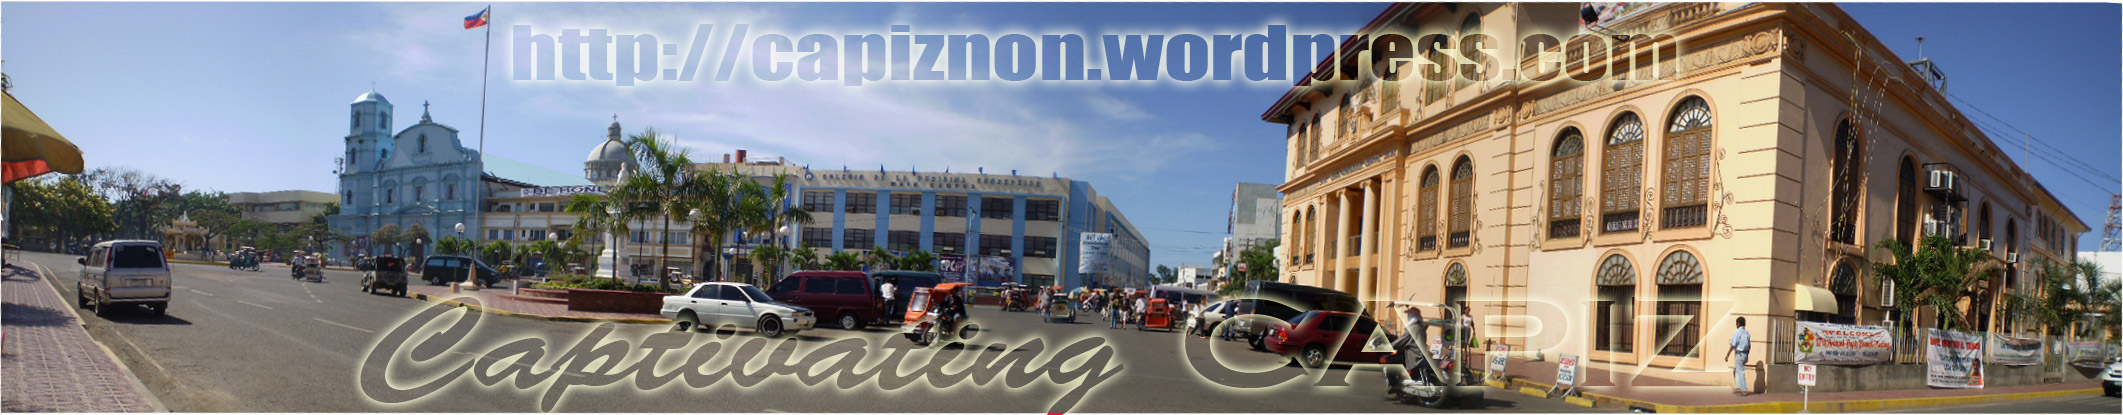 Roxas City (Capiz) Philippines  city photos : ... | Captivating Capiz Roxas City Seafood Capital of the Philippines